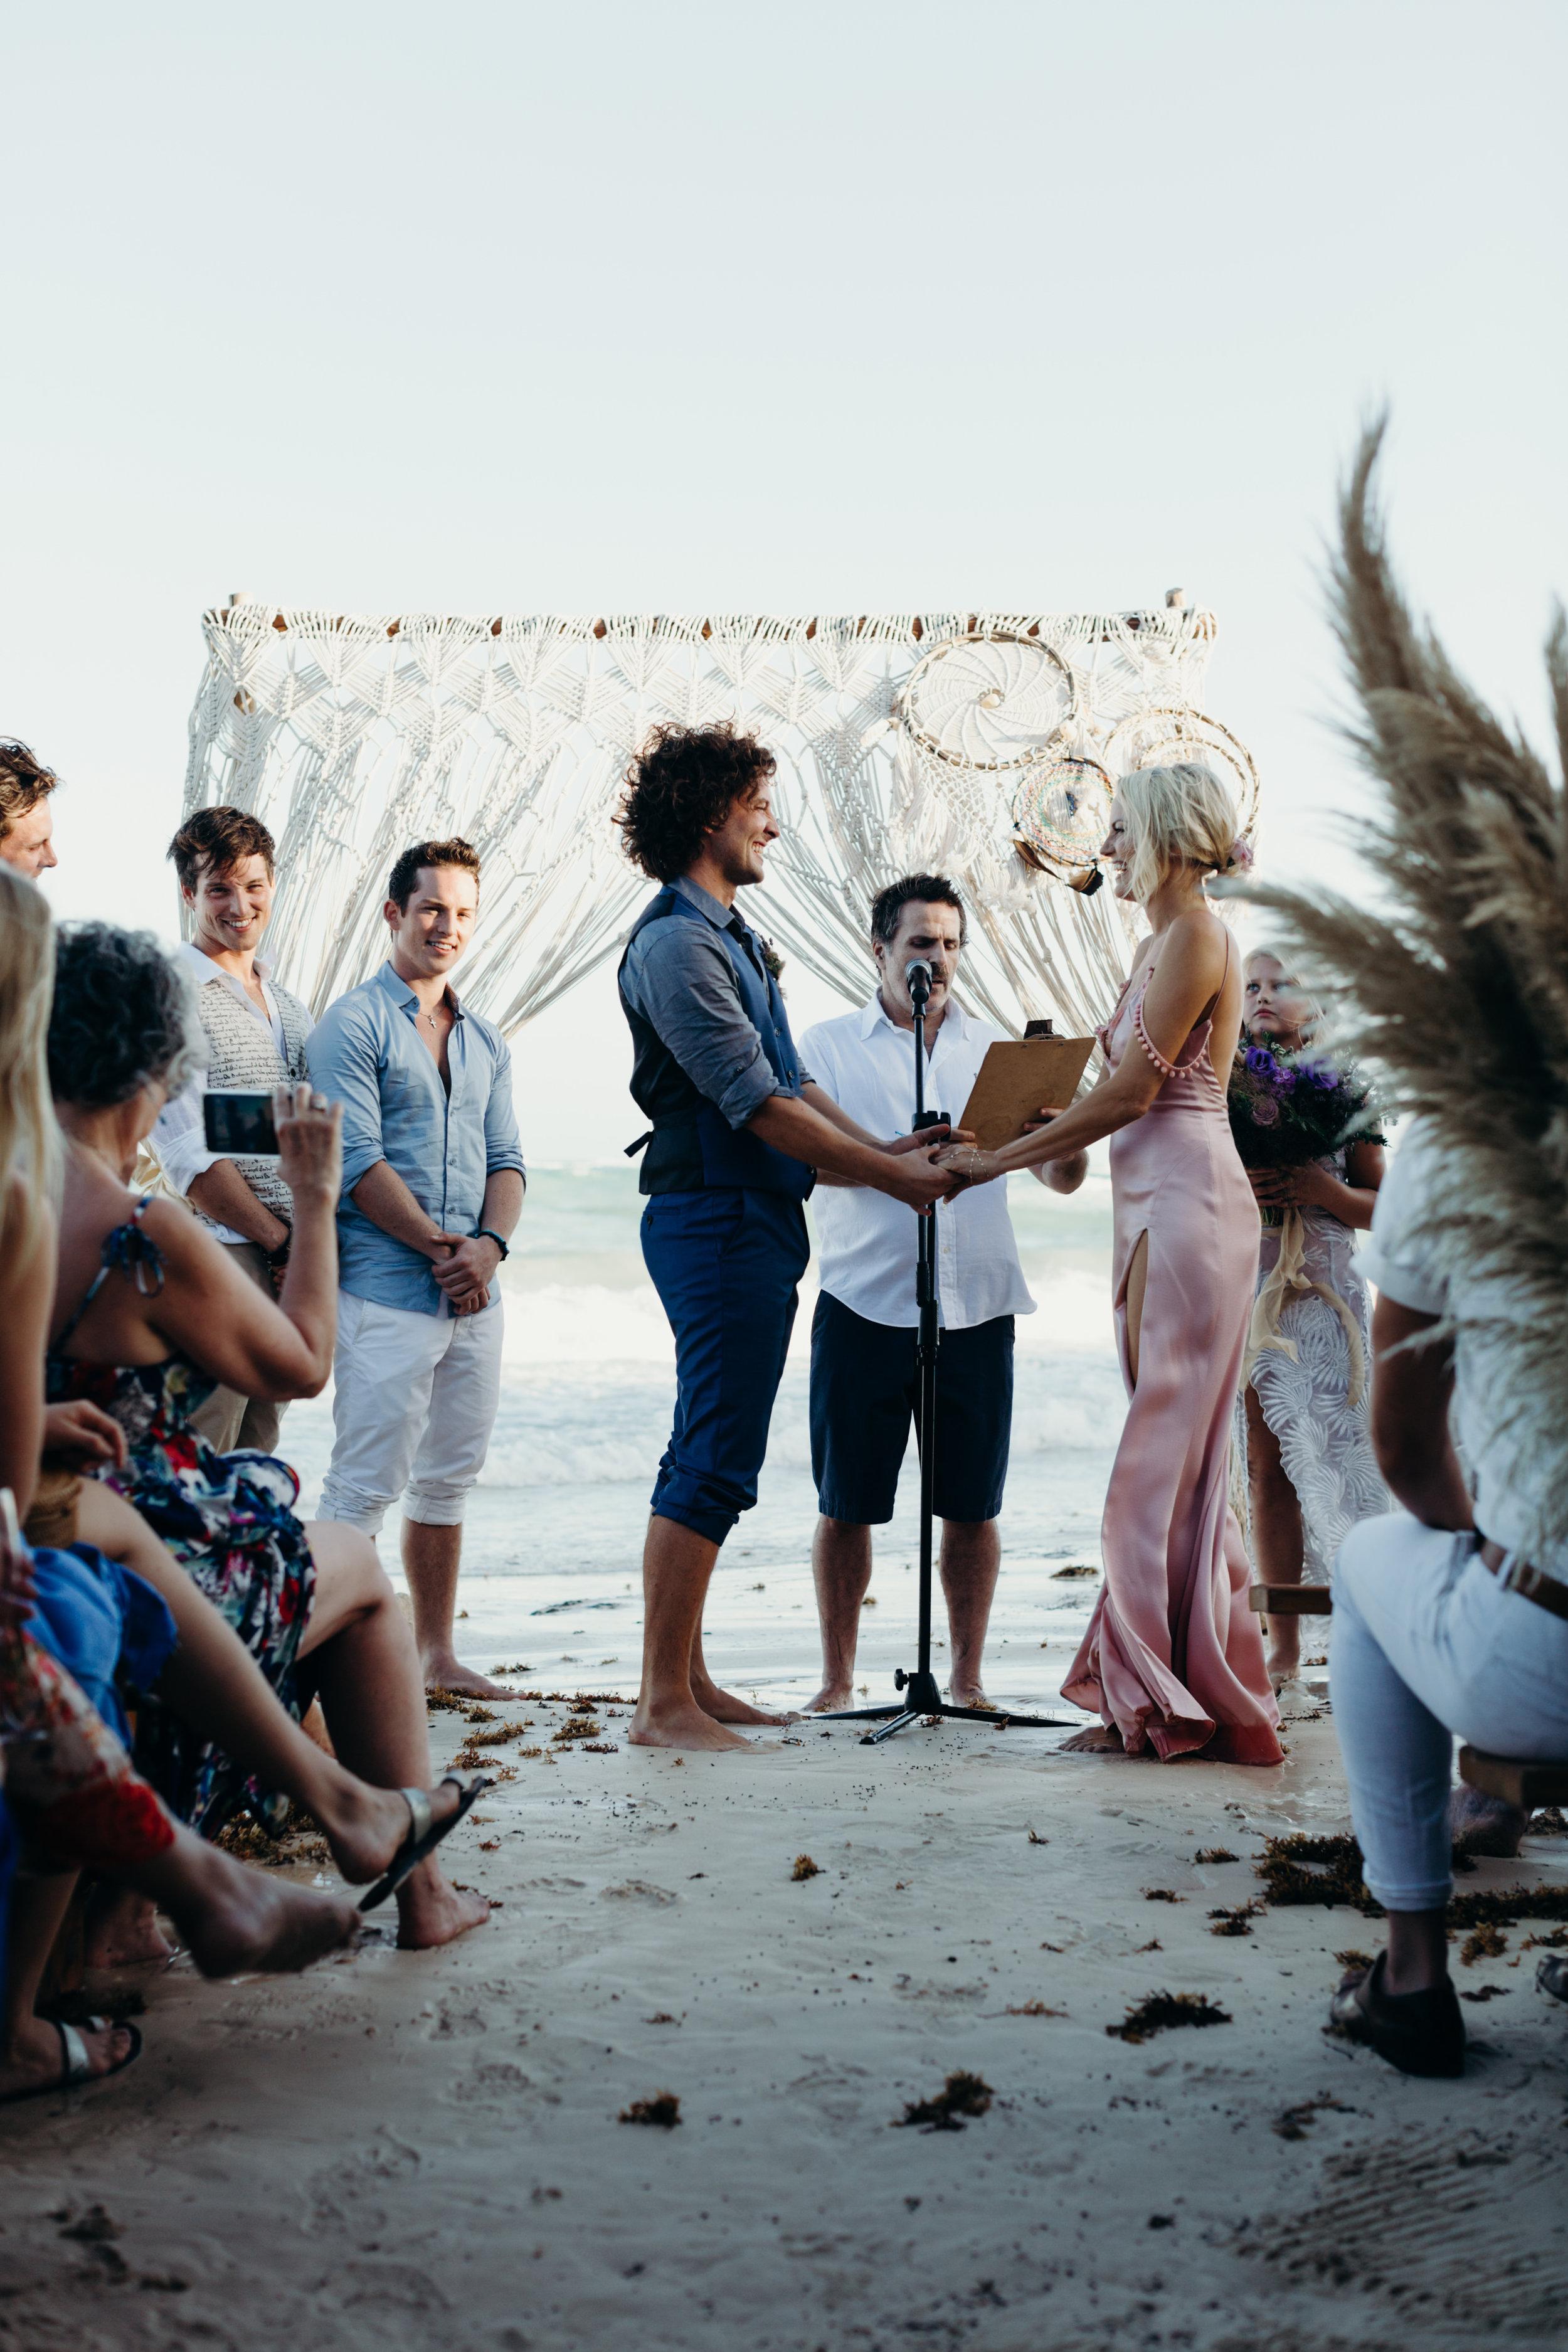 Malin-Akerman-Wedding-Tulum-Andrea-Freeman-Events-10.JPG